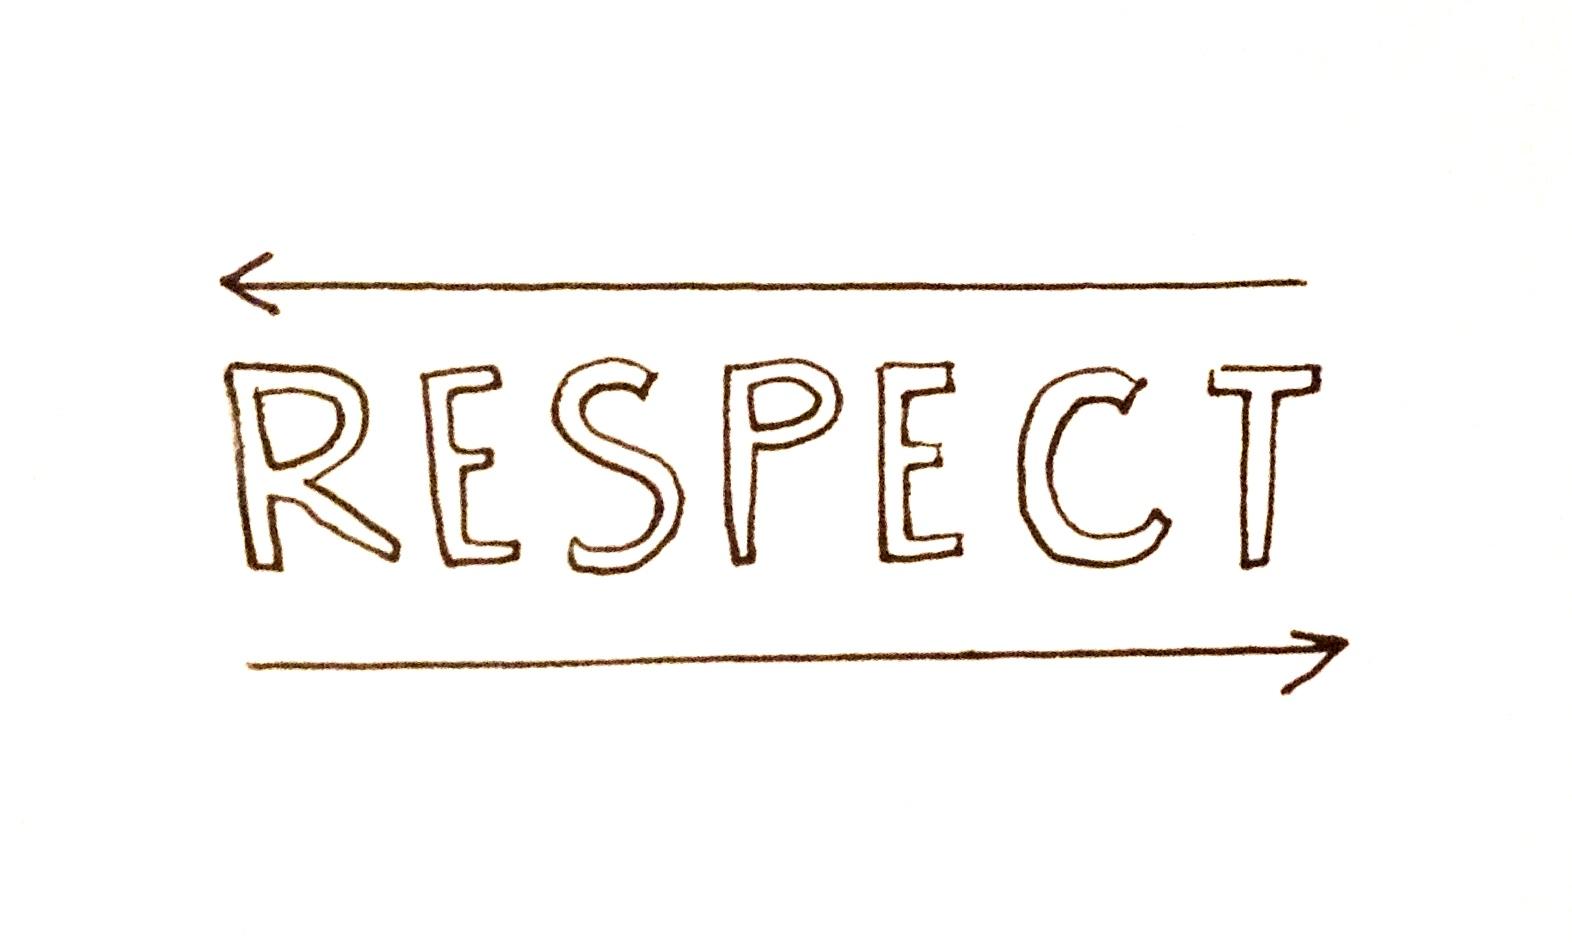 2. Respect